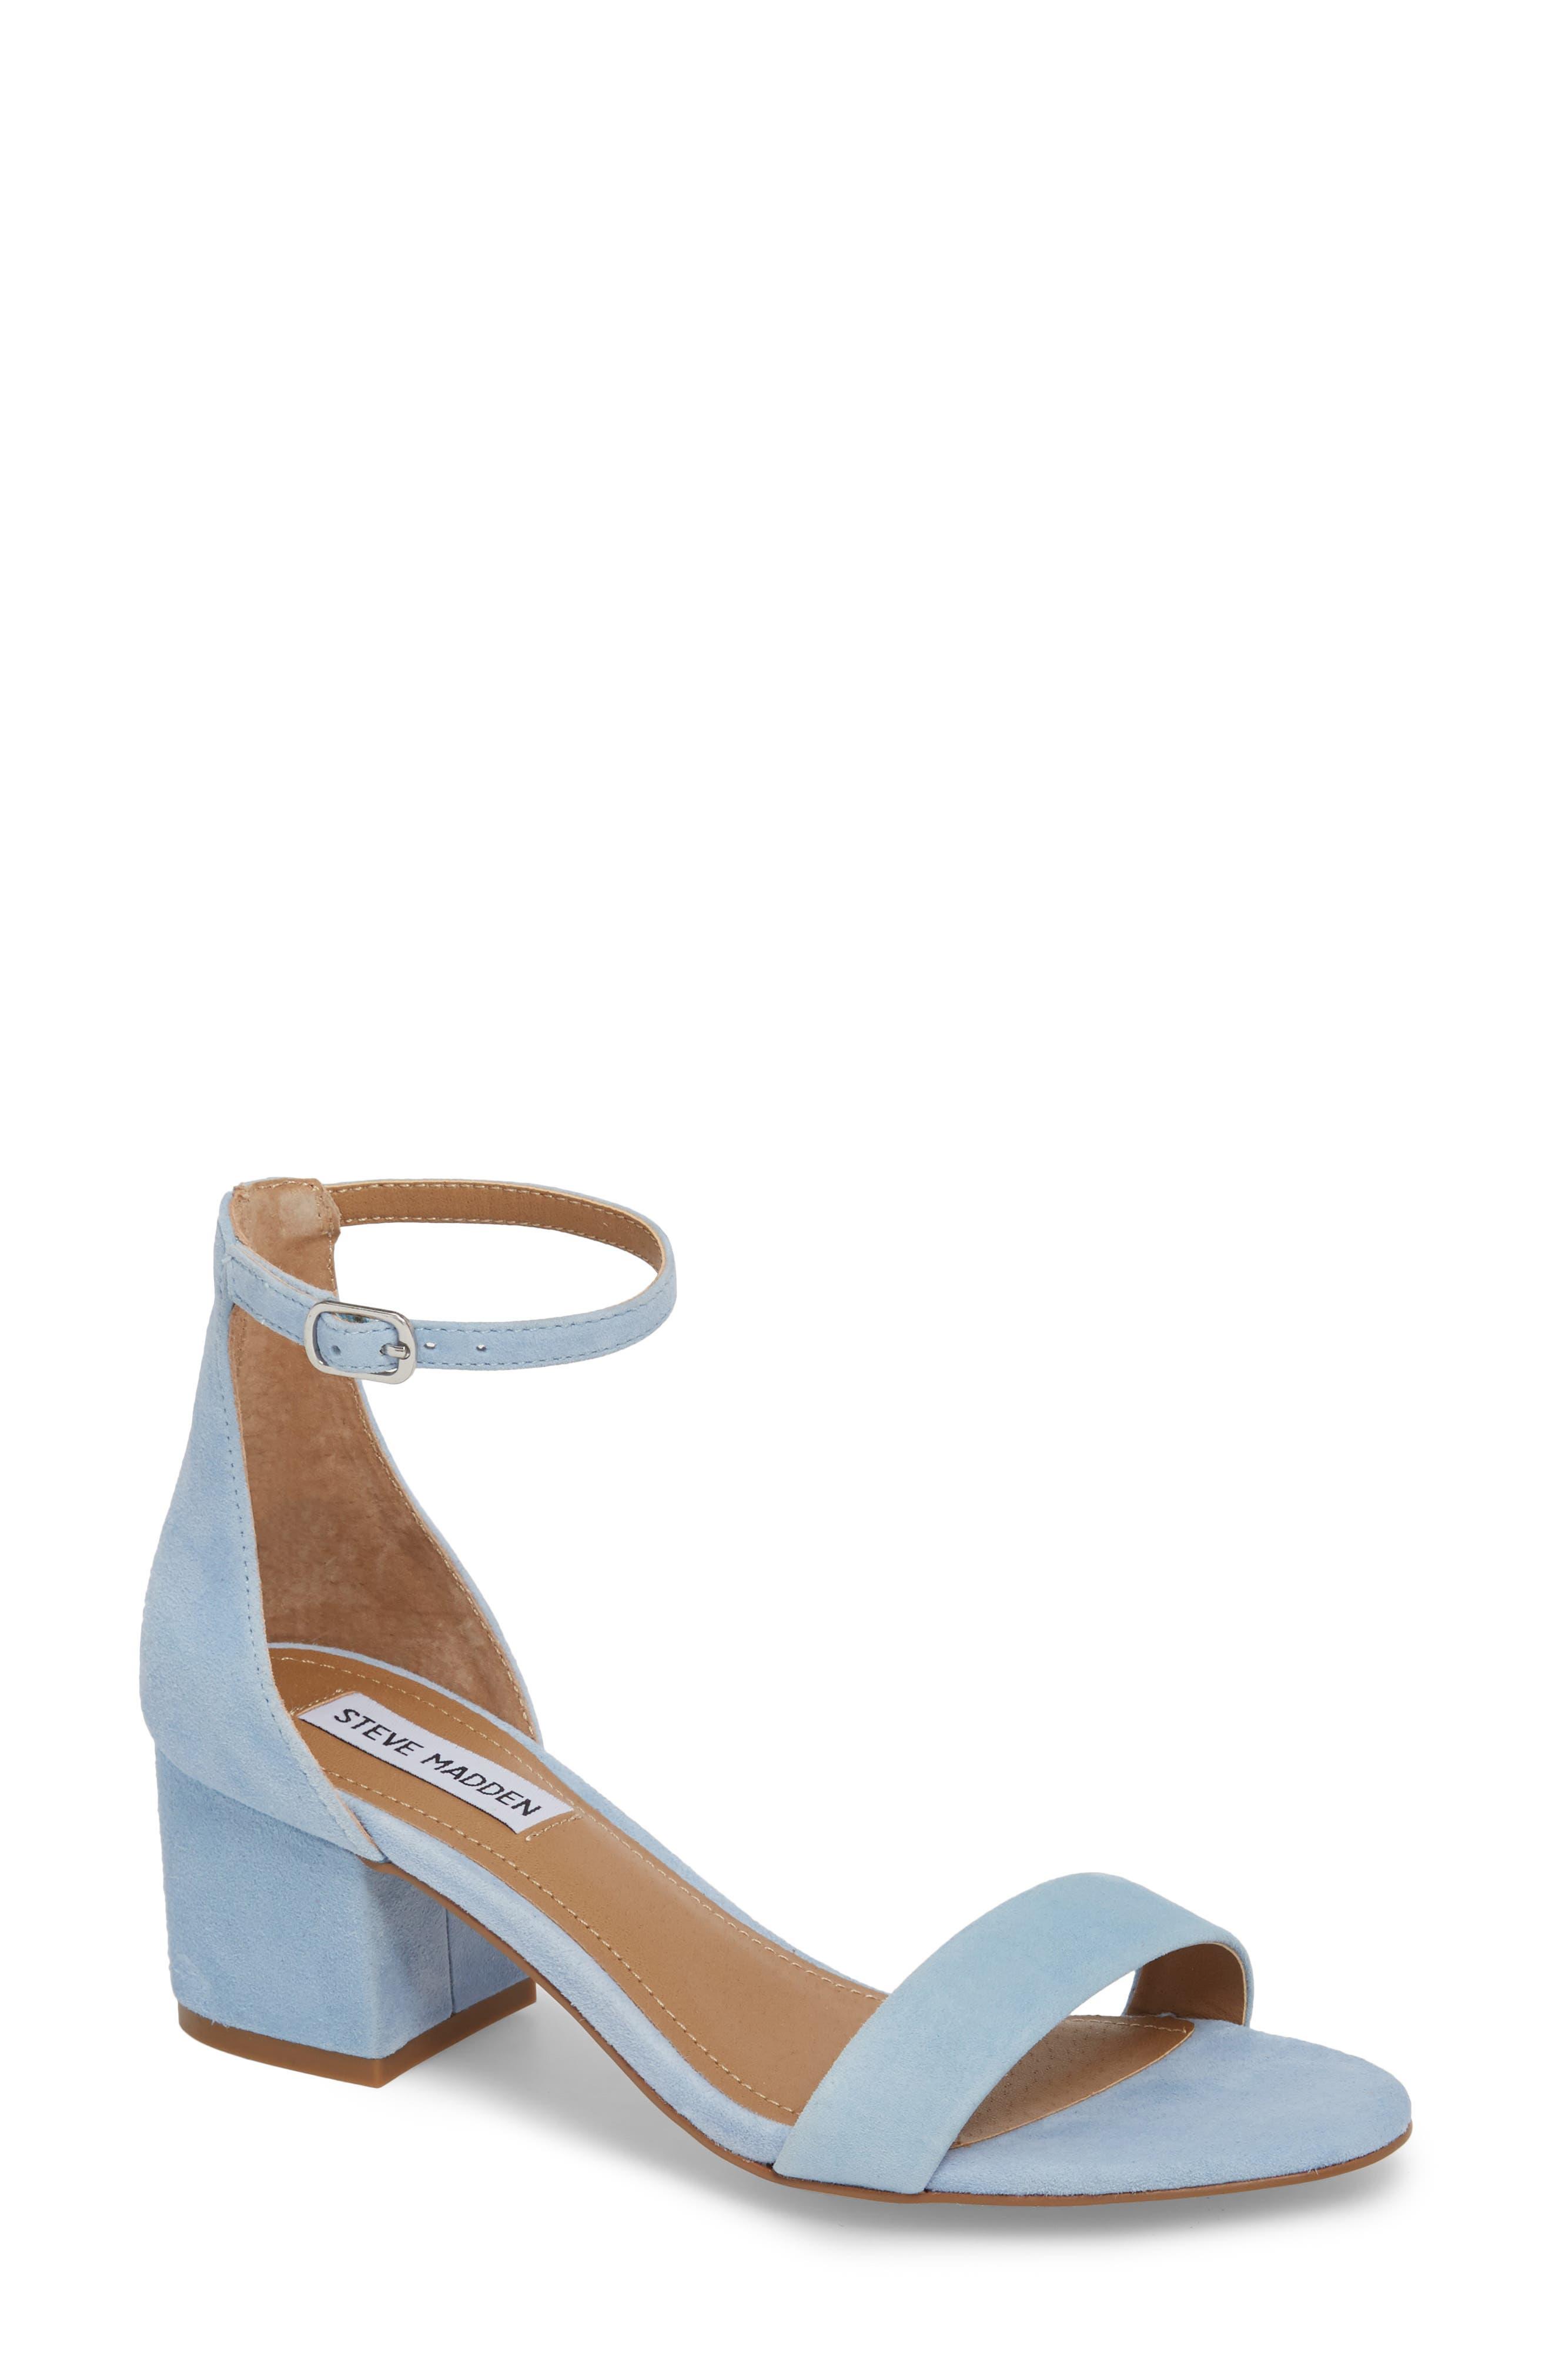 Irenee Ankle Strap Sandal,                             Main thumbnail 8, color,